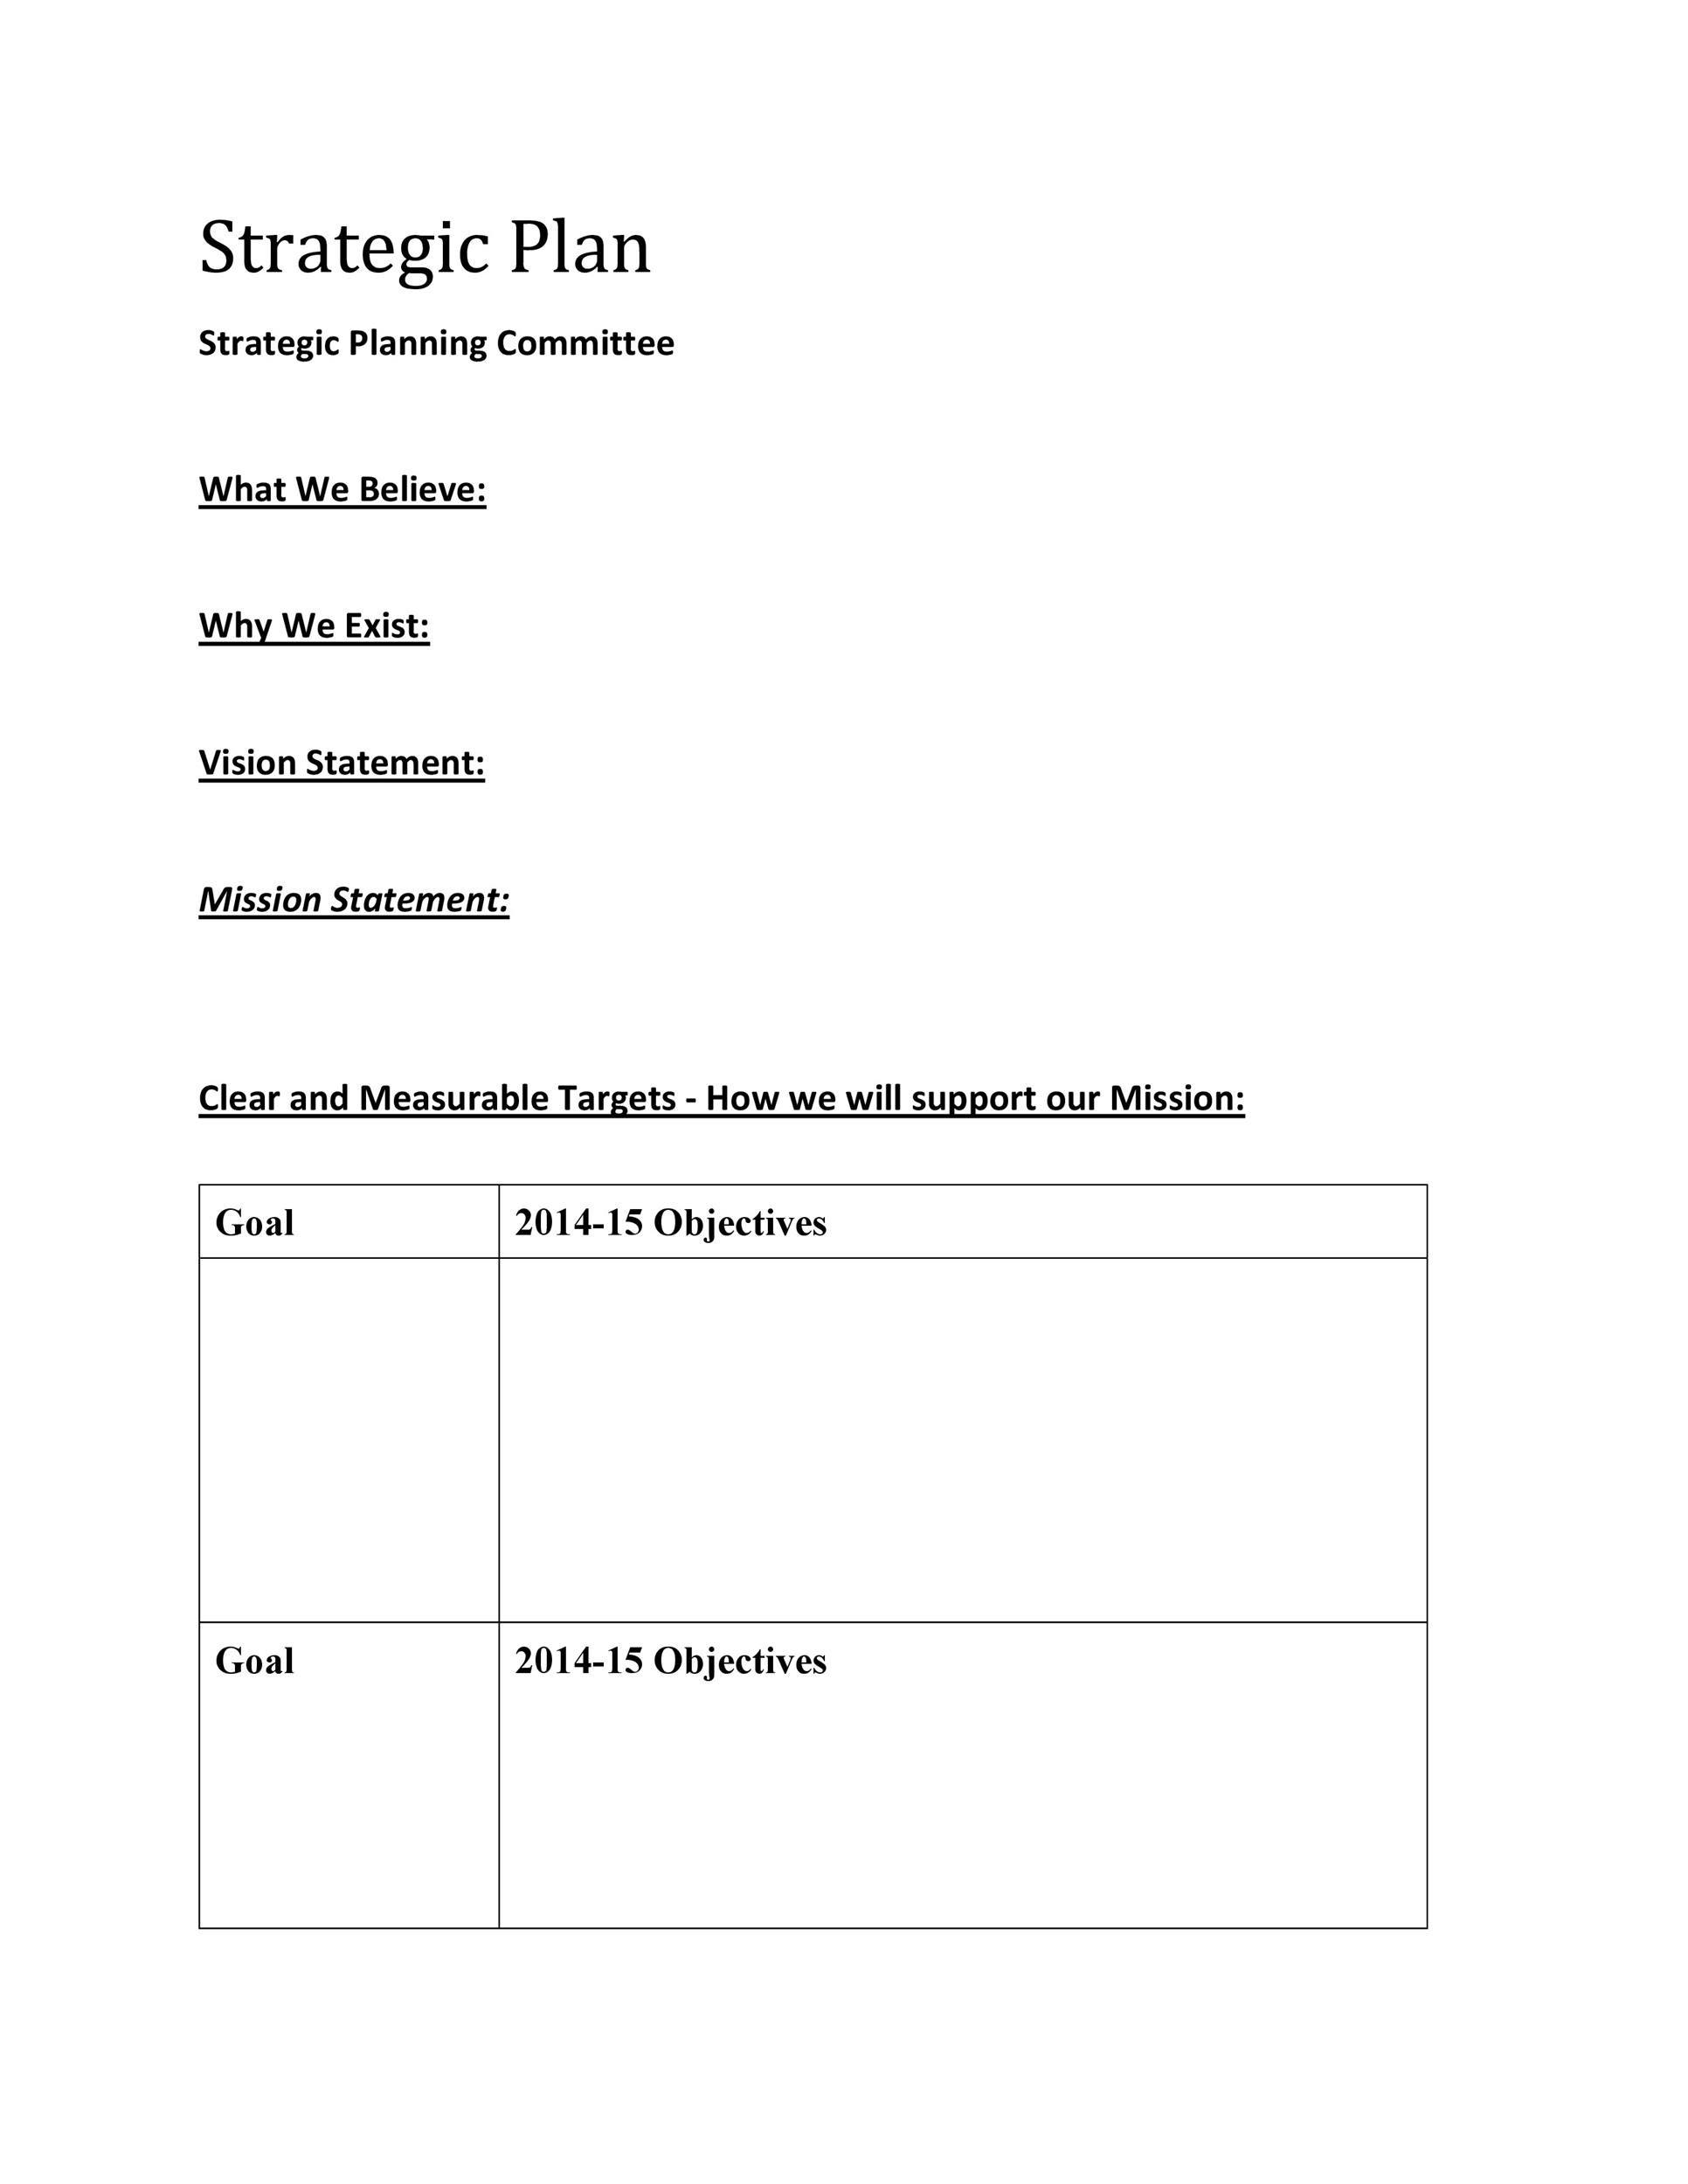 008 Top Strategic Plan Template Word Image  Format Busines DocFull